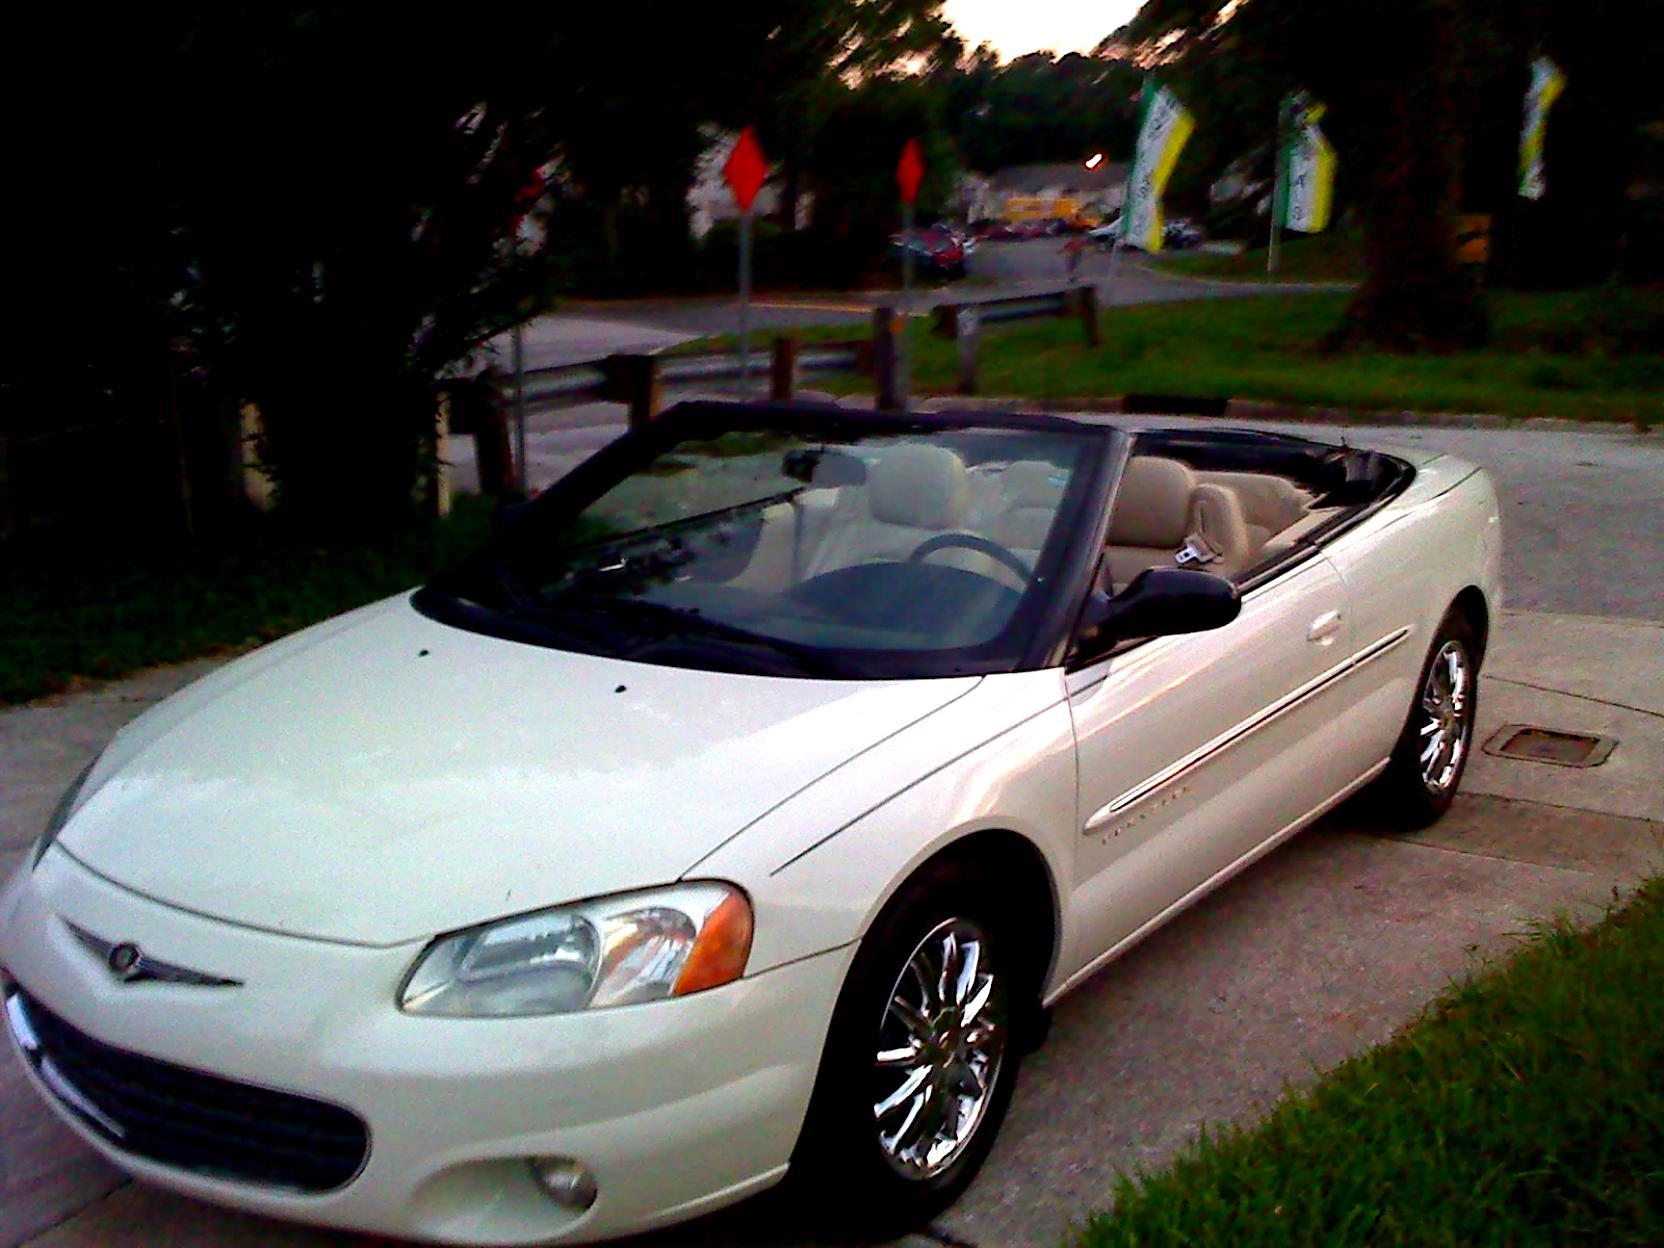 Chrysler Sebring Convertible 2001 5